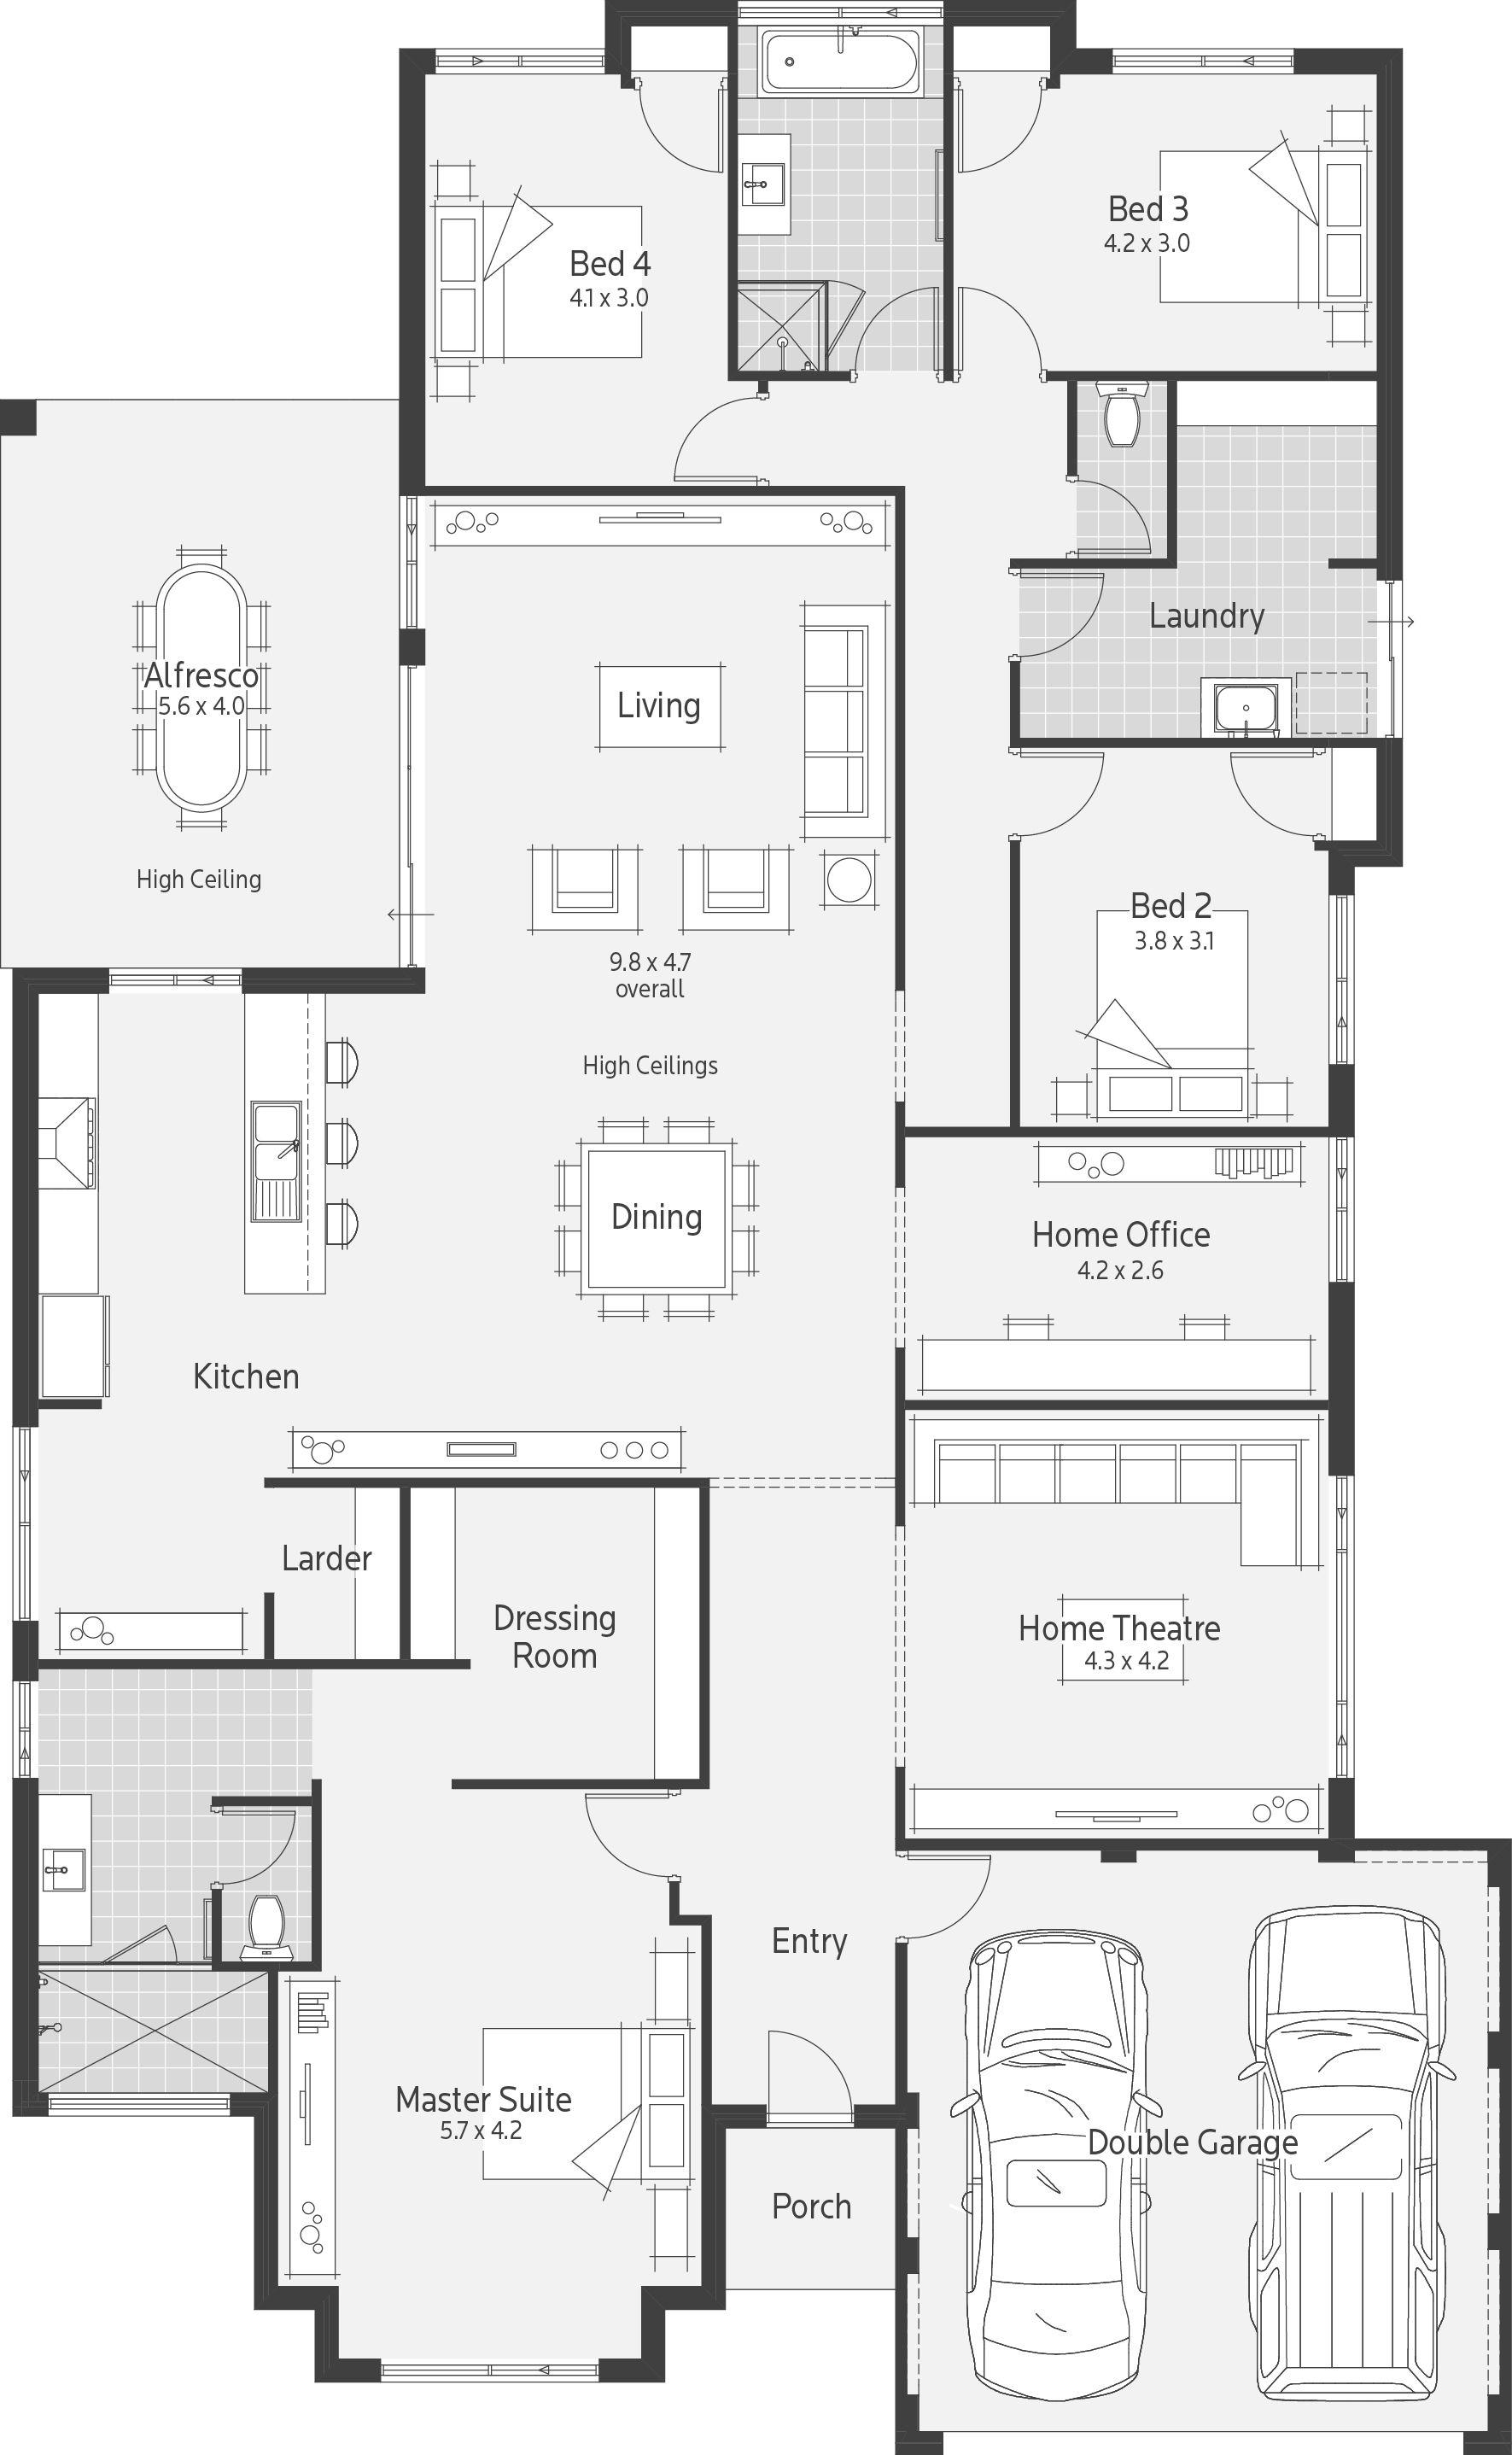 St Ali Dale Alcock Homes Home Design Floor Plans Floor Plans